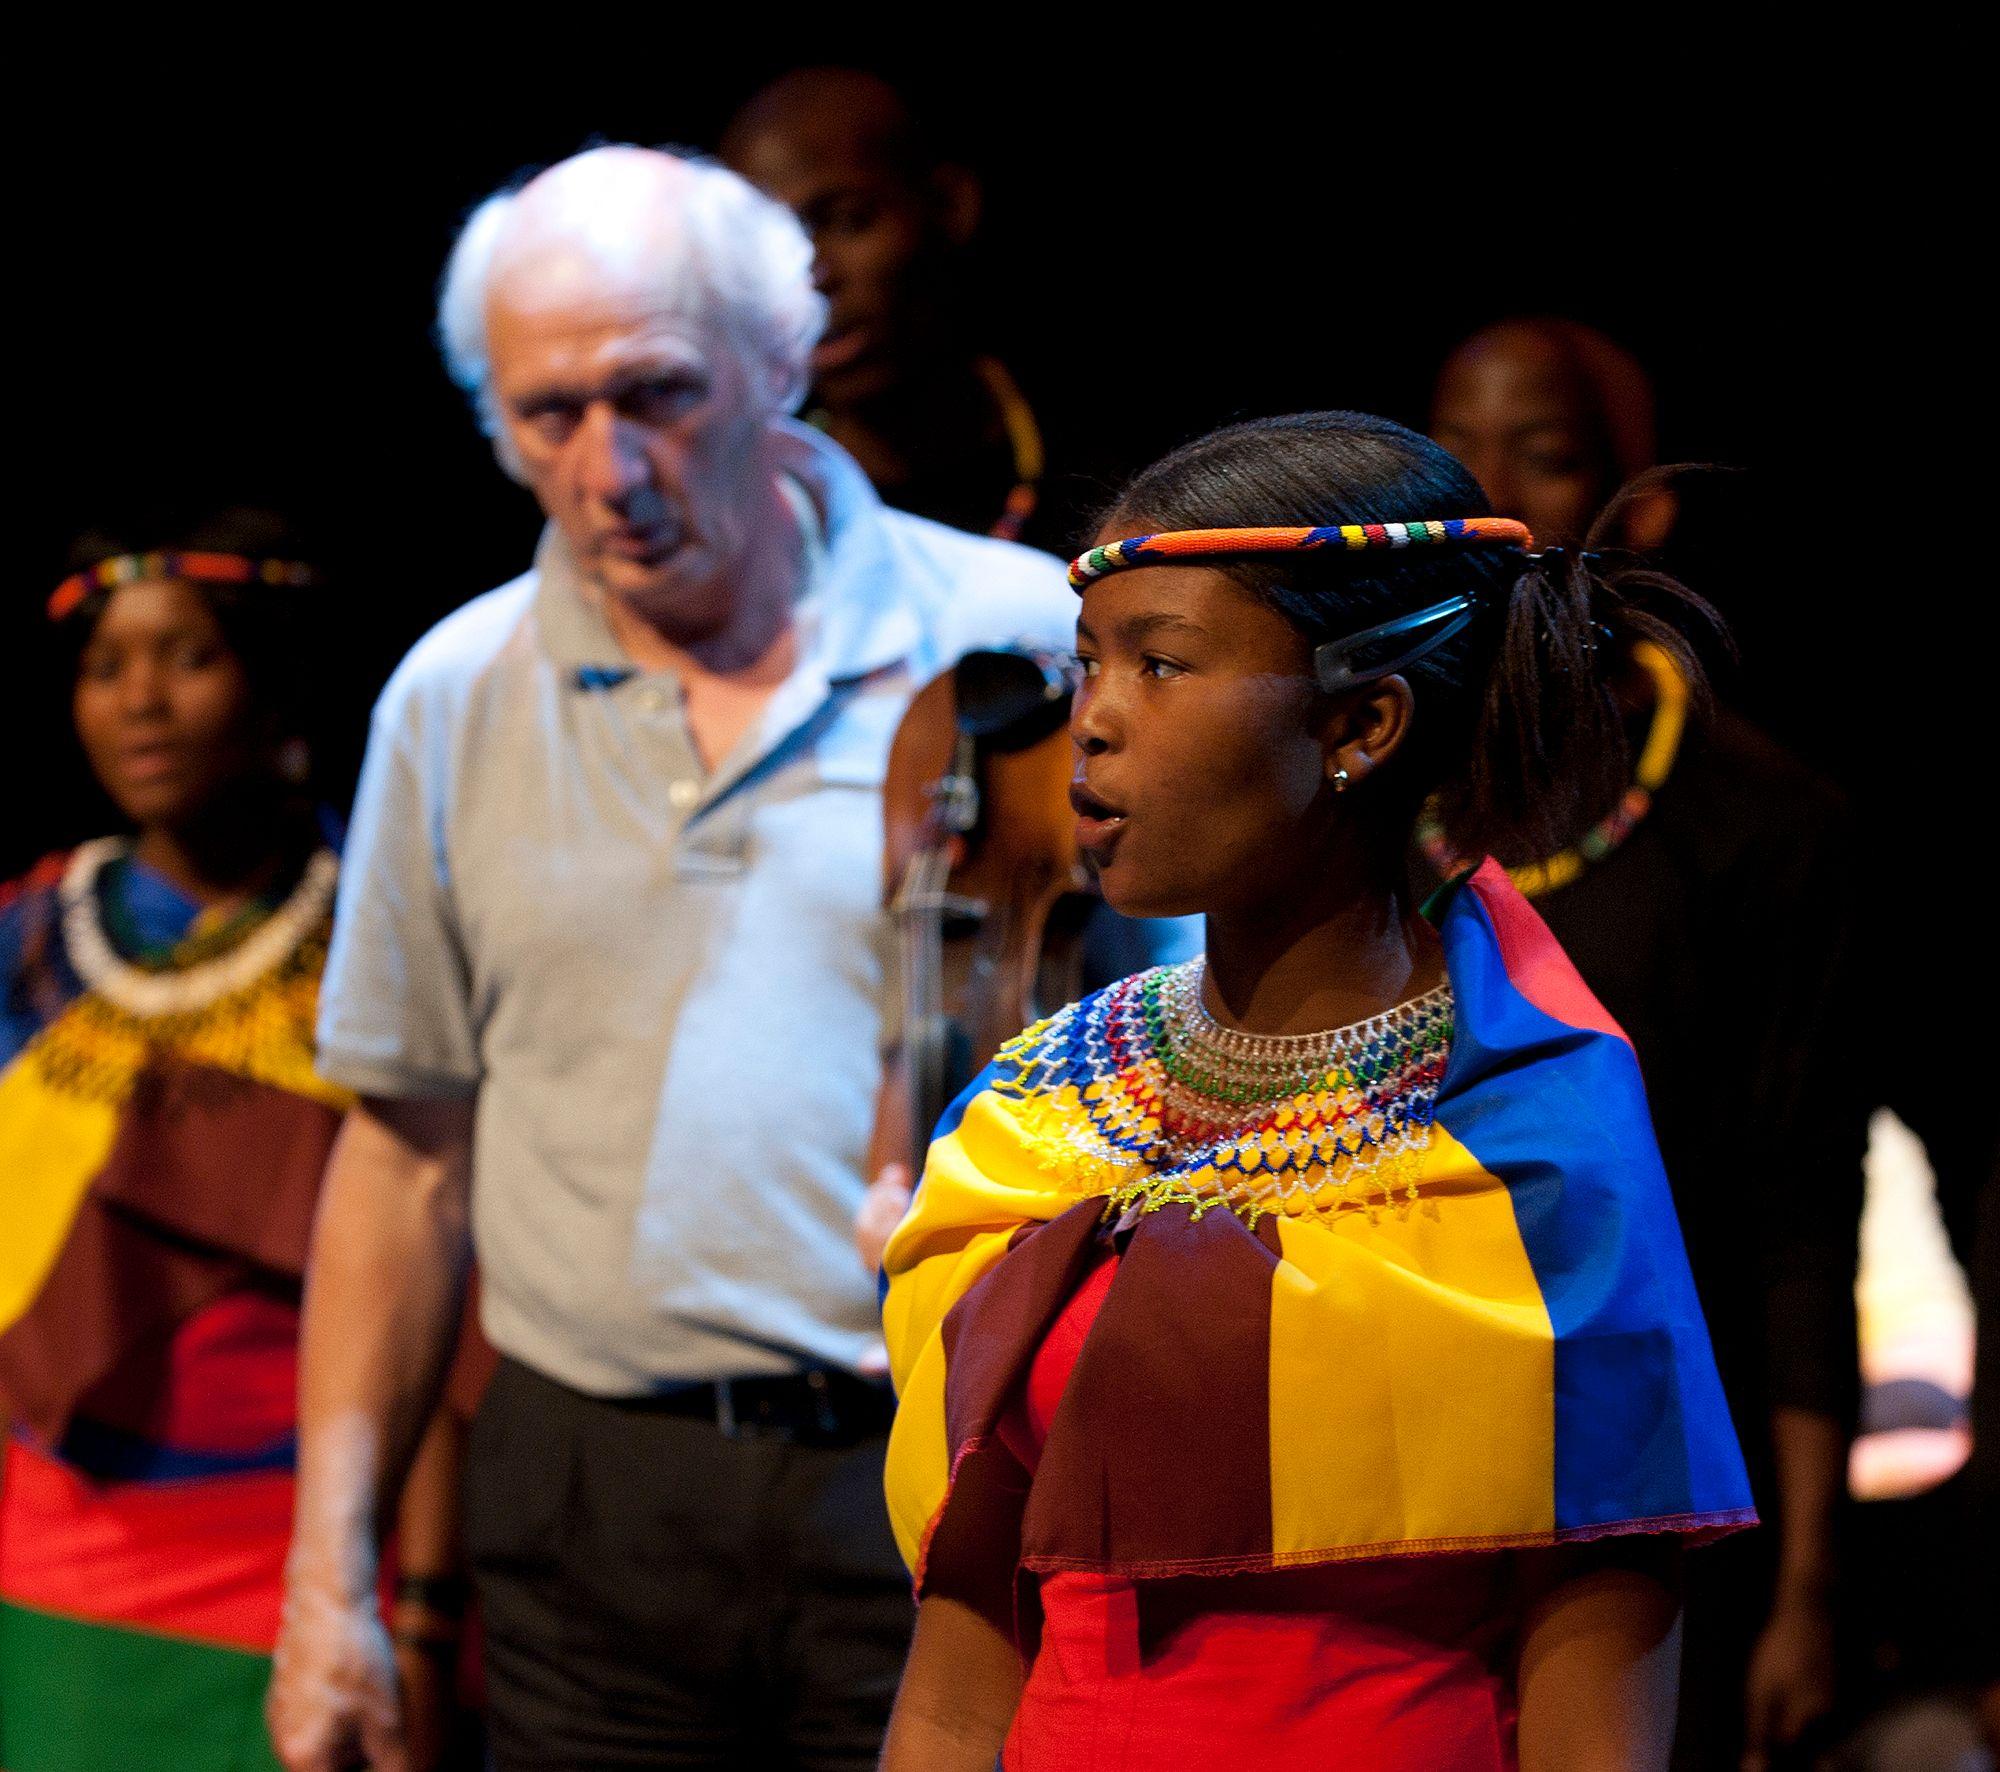 Dutch Singer Herman van Veen uses his music for child rights ©Casper van Aggelen